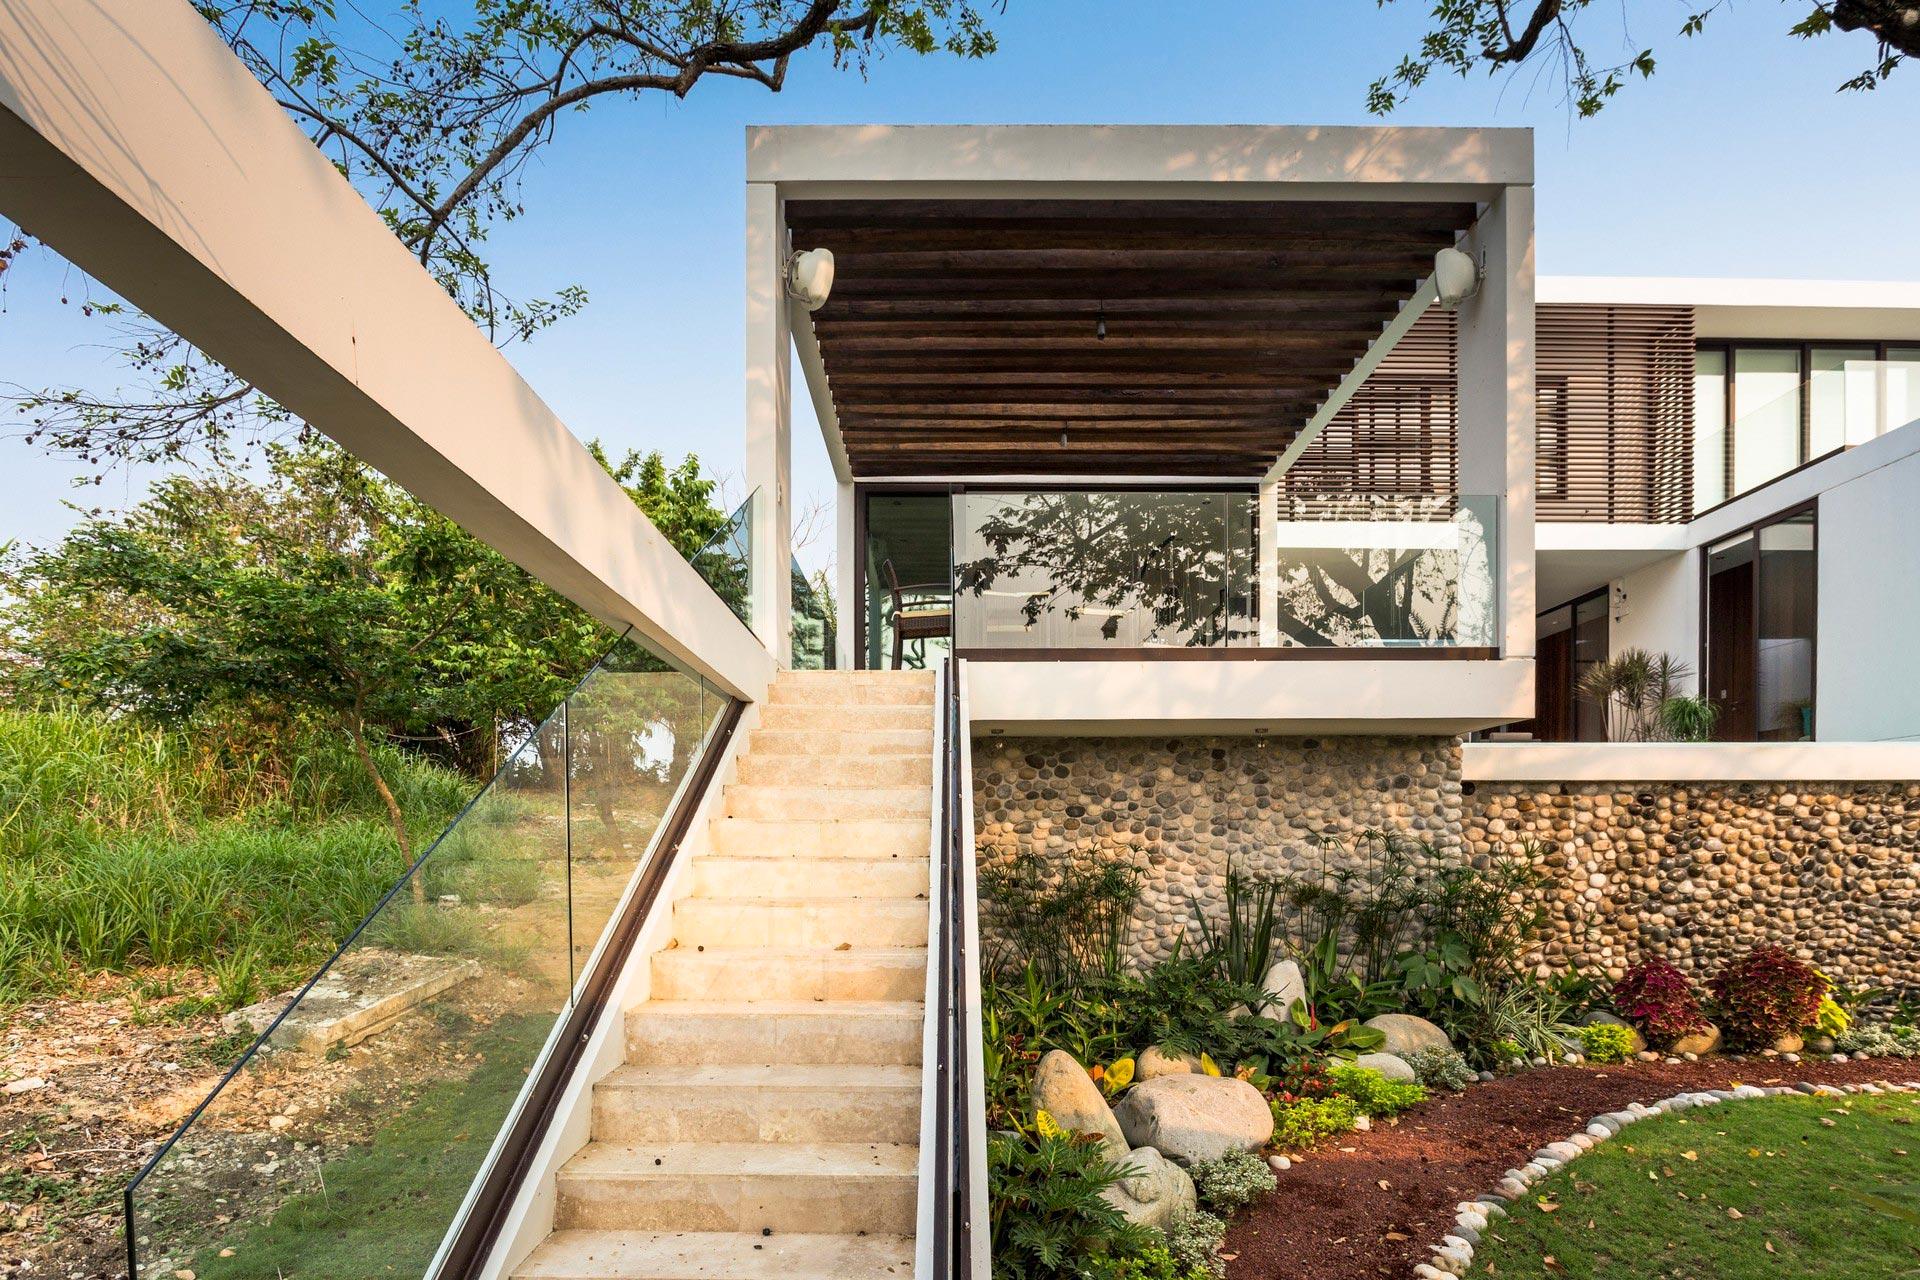 Modern Ecofriendly House In Mexico  Adorable Home